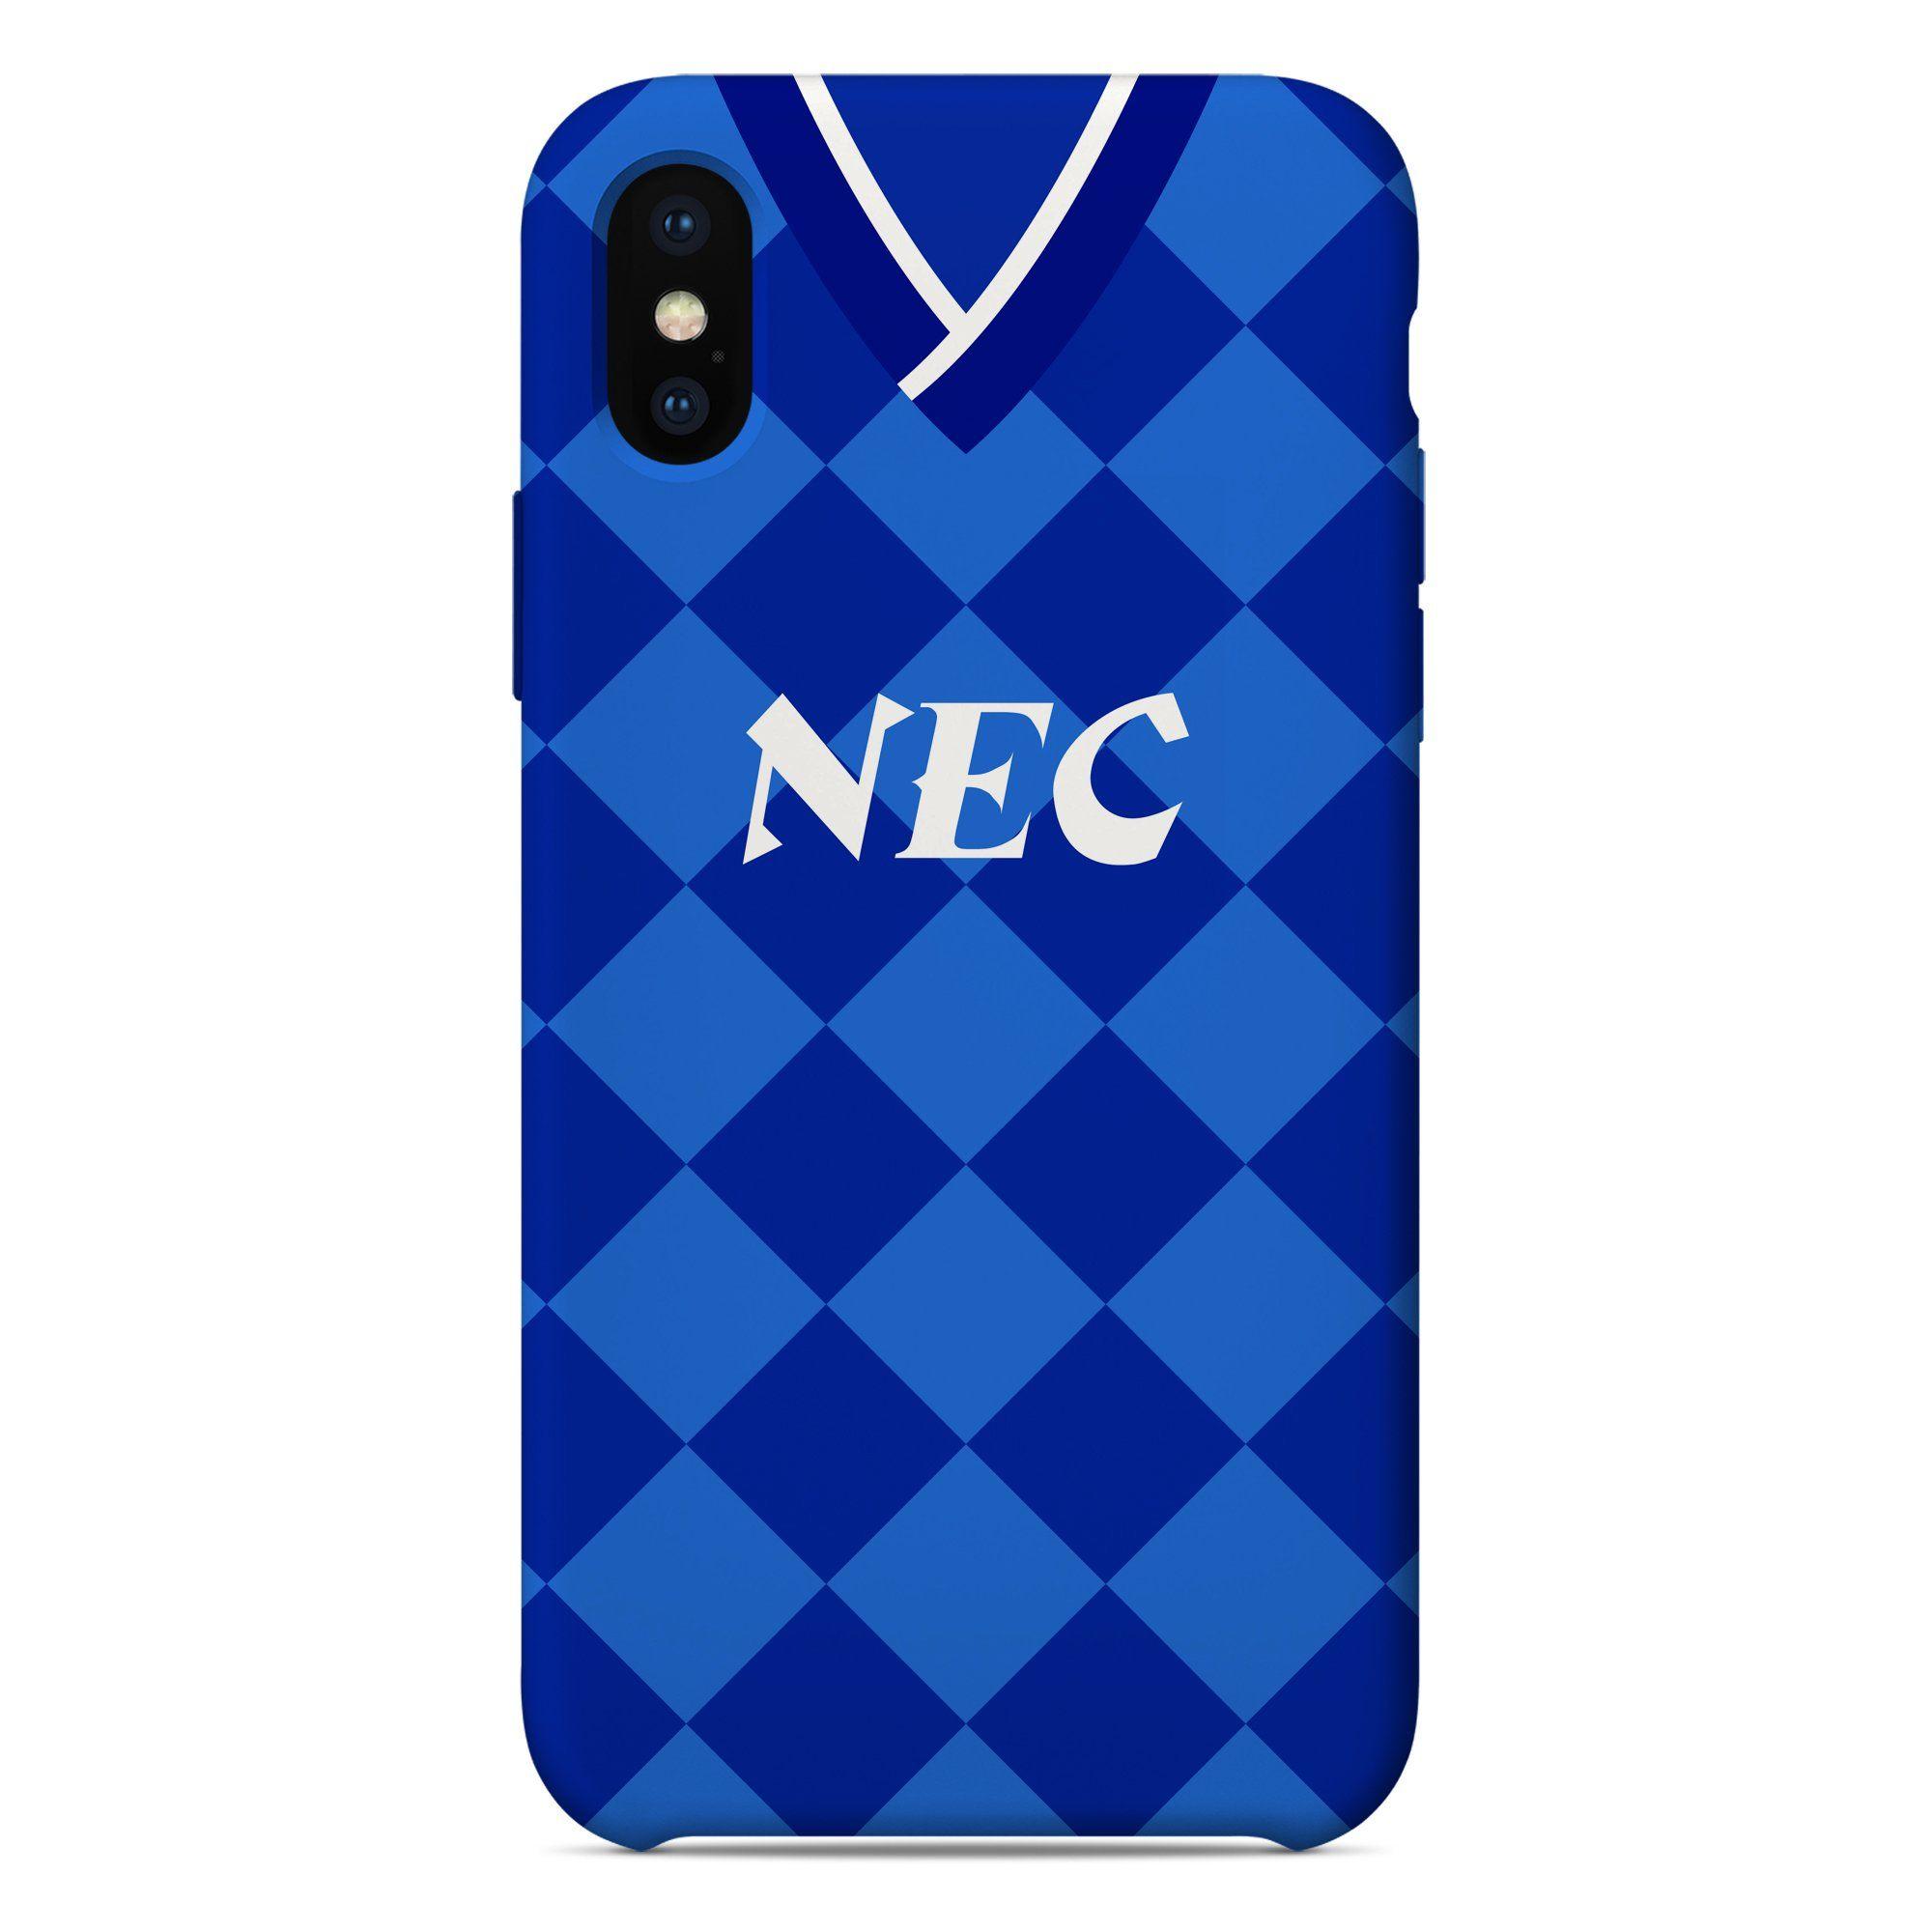 c2b745fc60b Everton 1986-1989 Home Shirt - iPhone   Samsung Galaxy Phone Case ...